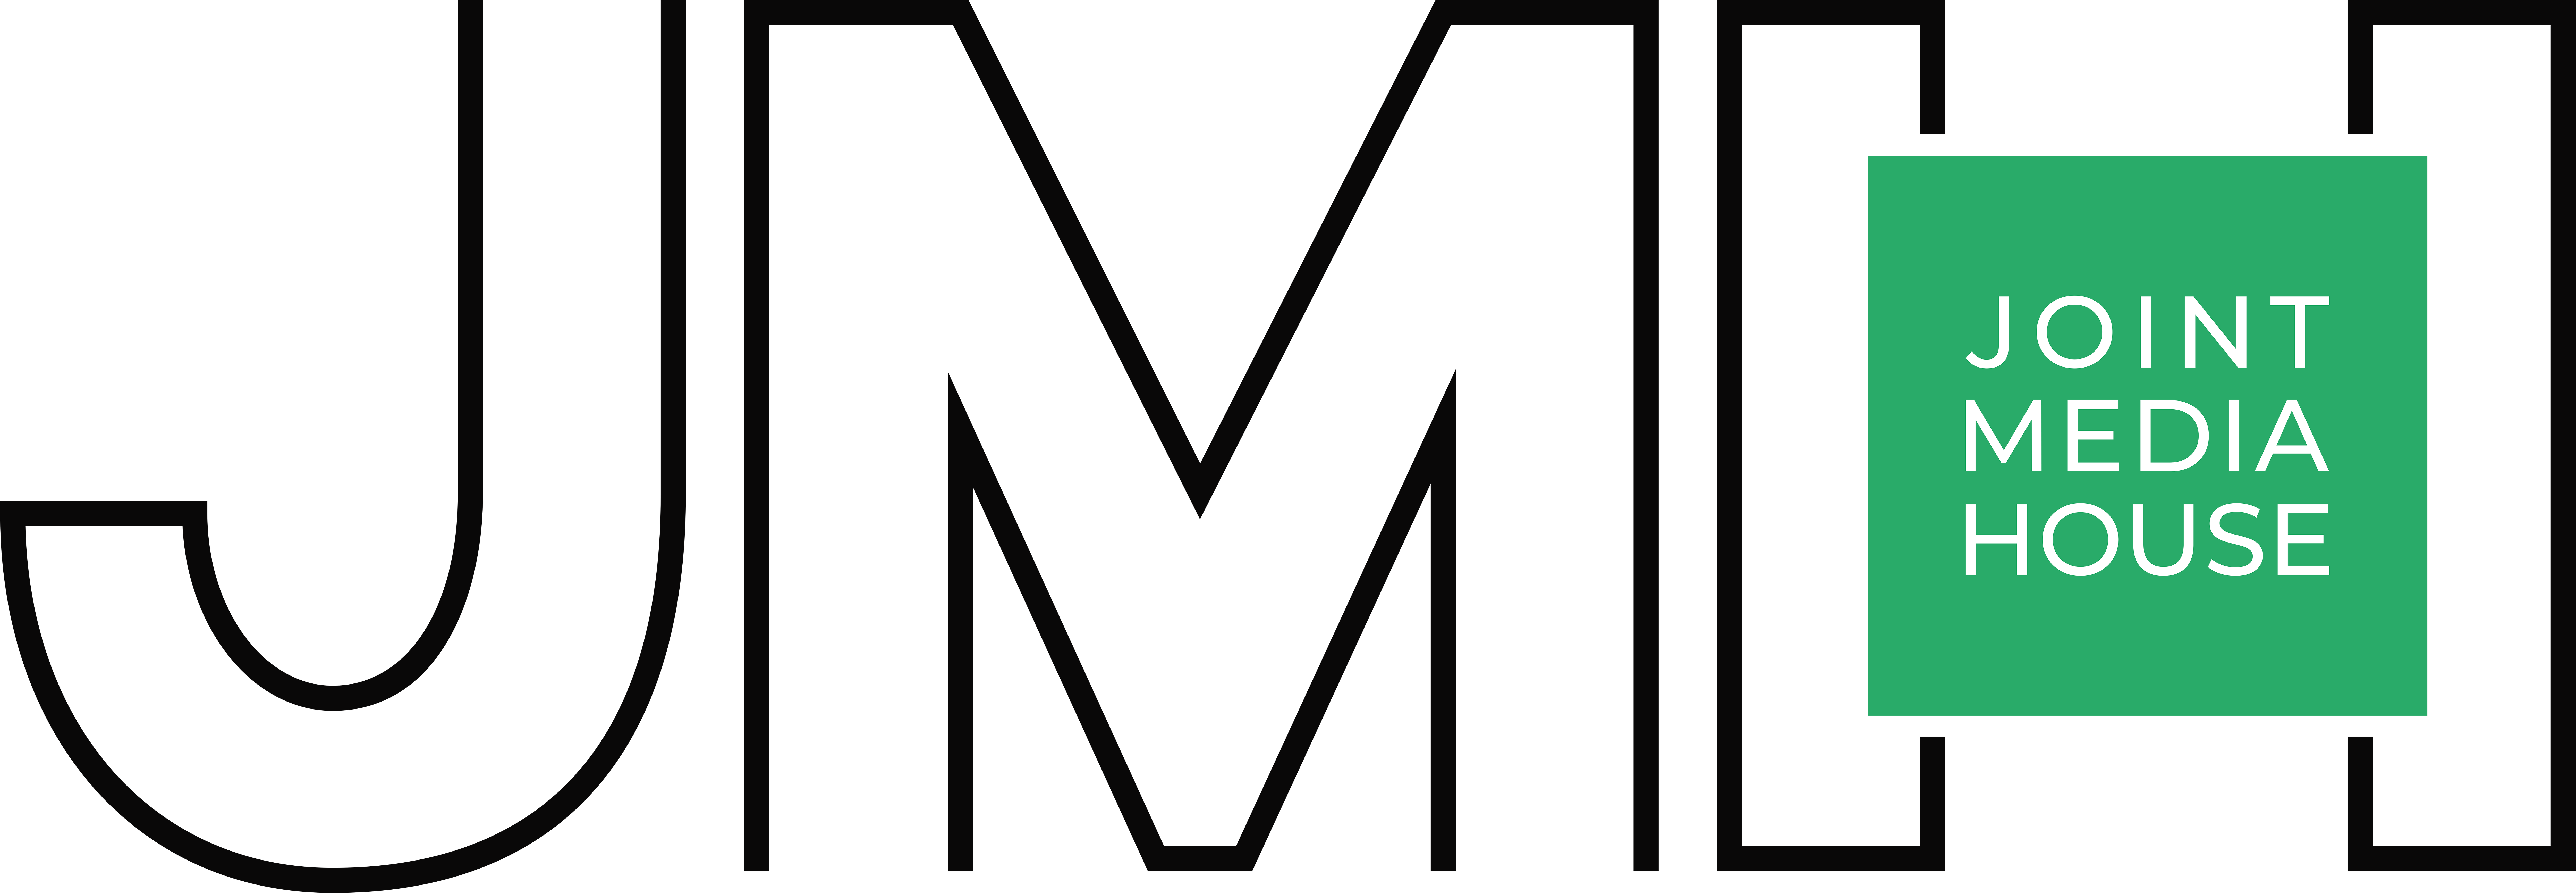 Joint Media House, a chatbot developer